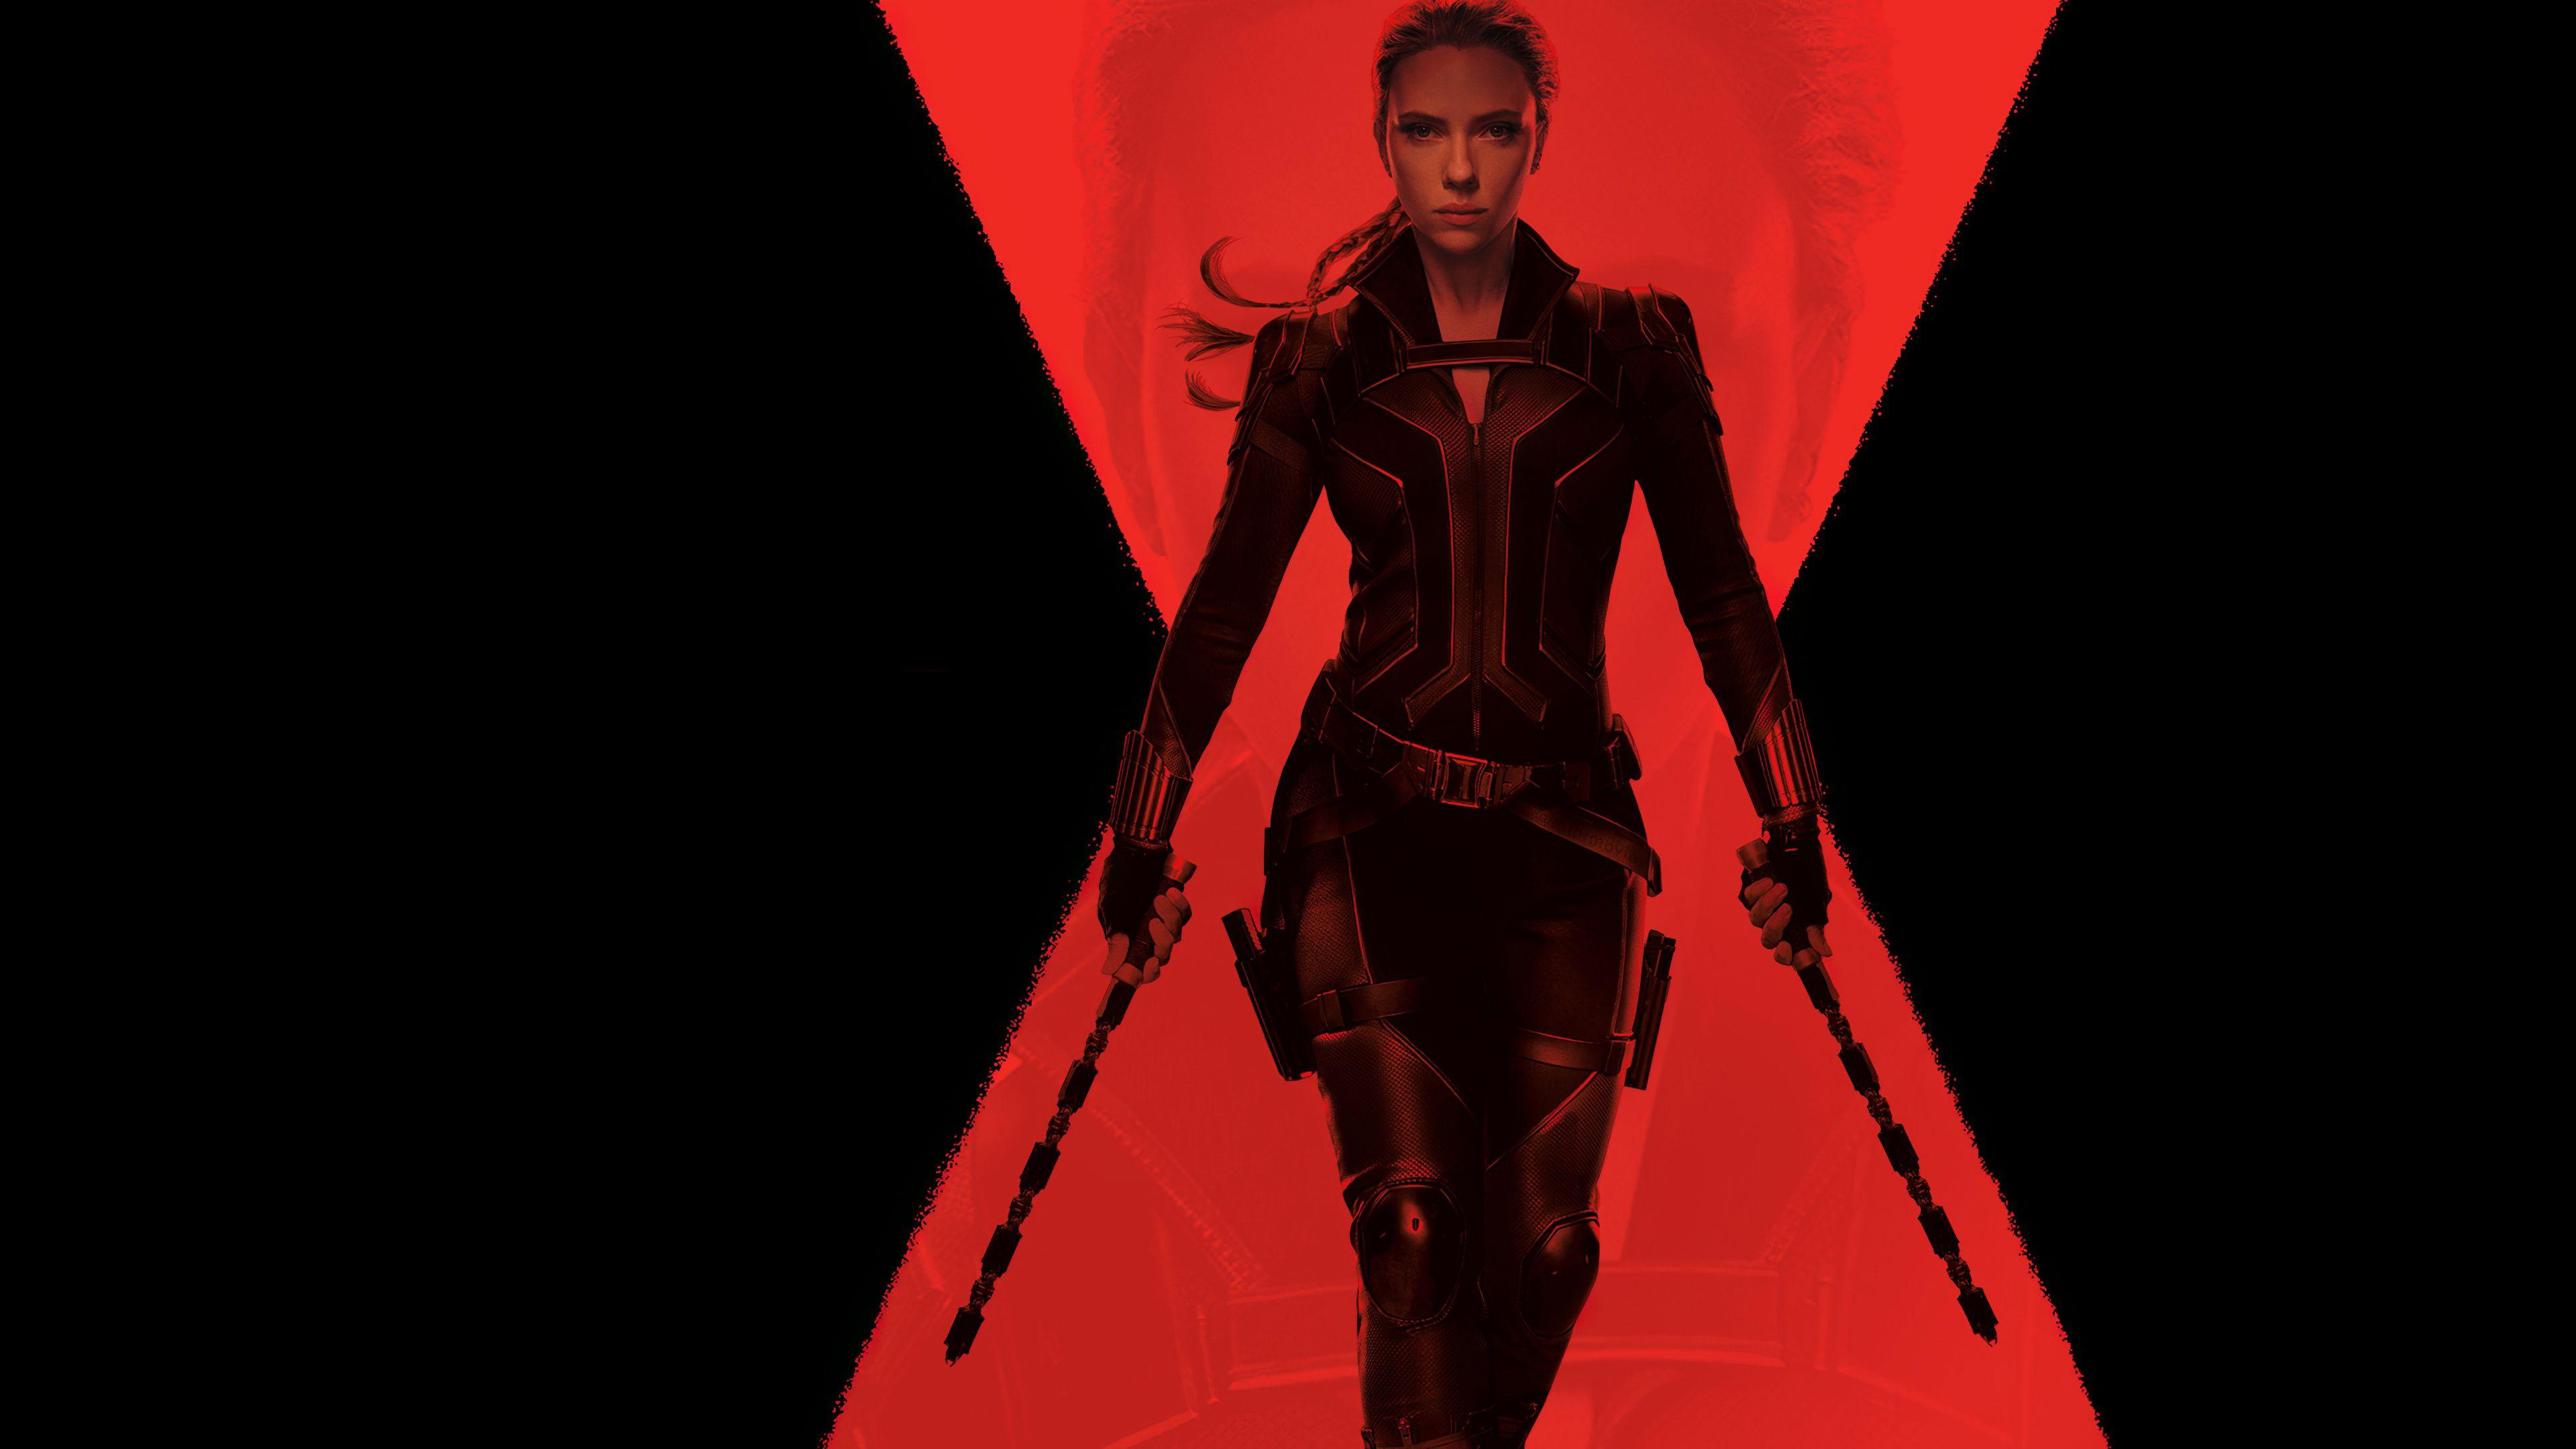 Black Widow 2020 Movie Black Widow 2020 Movie Wallpapers 4k Black Widow Movie Movie Black 2020 Movies